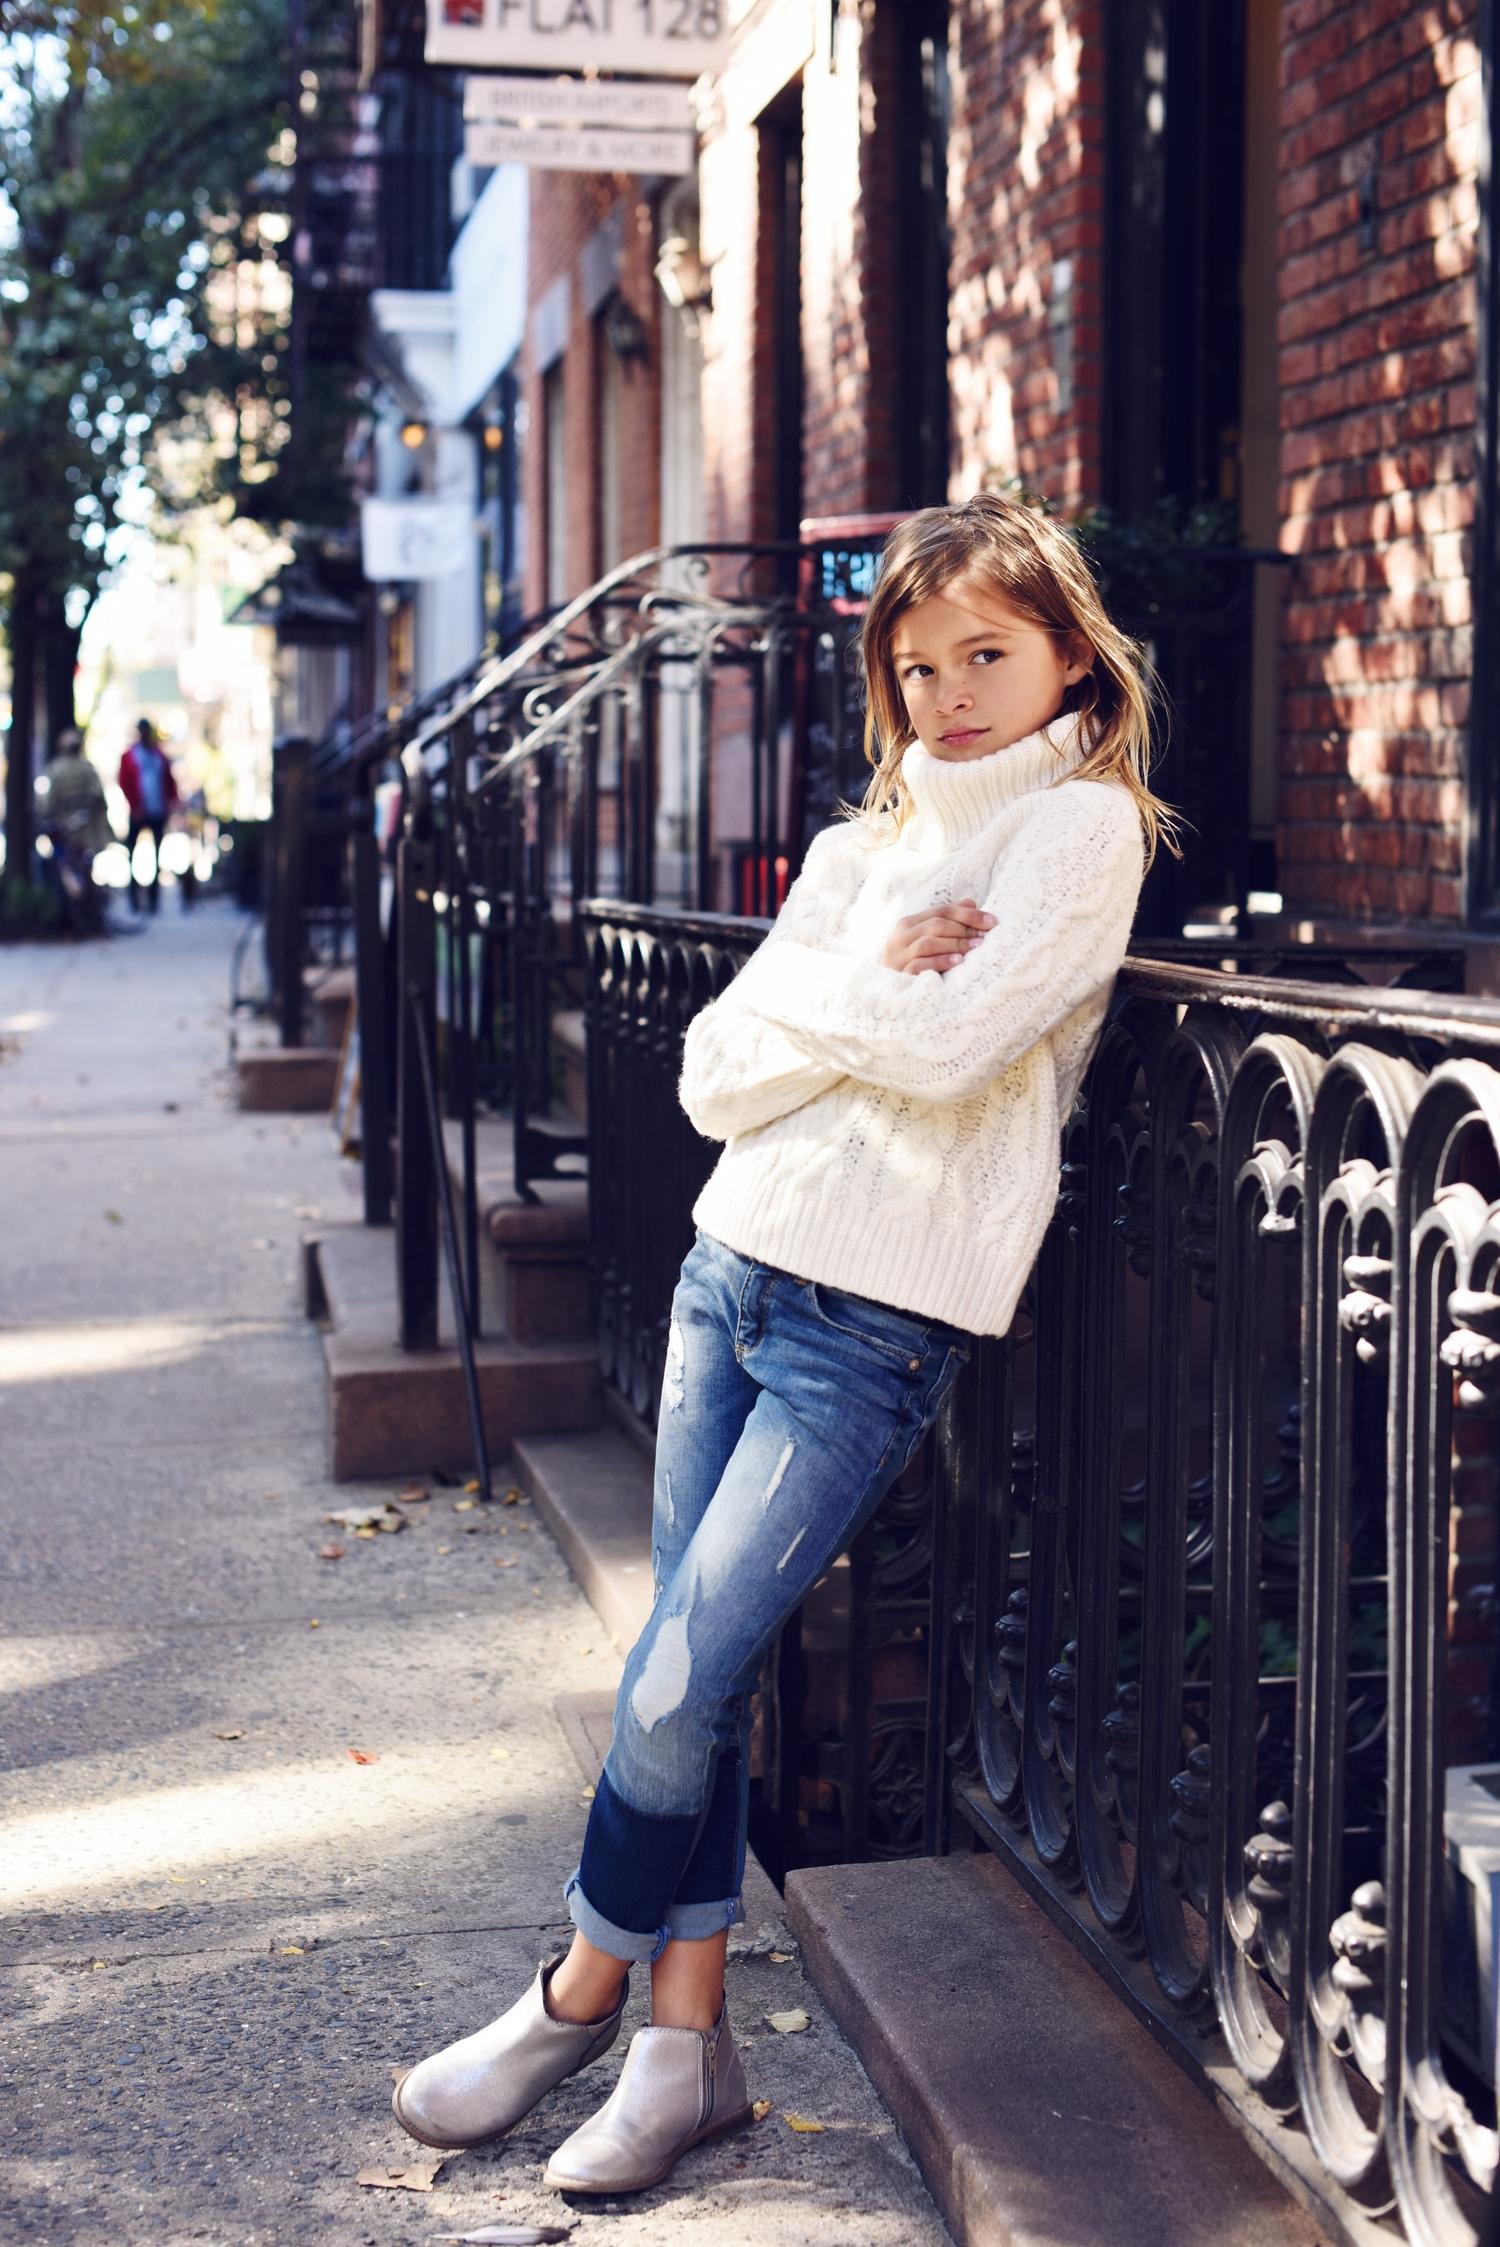 Enfant+Street+Style+by+Gina+Kim+Photography-21.jpeg